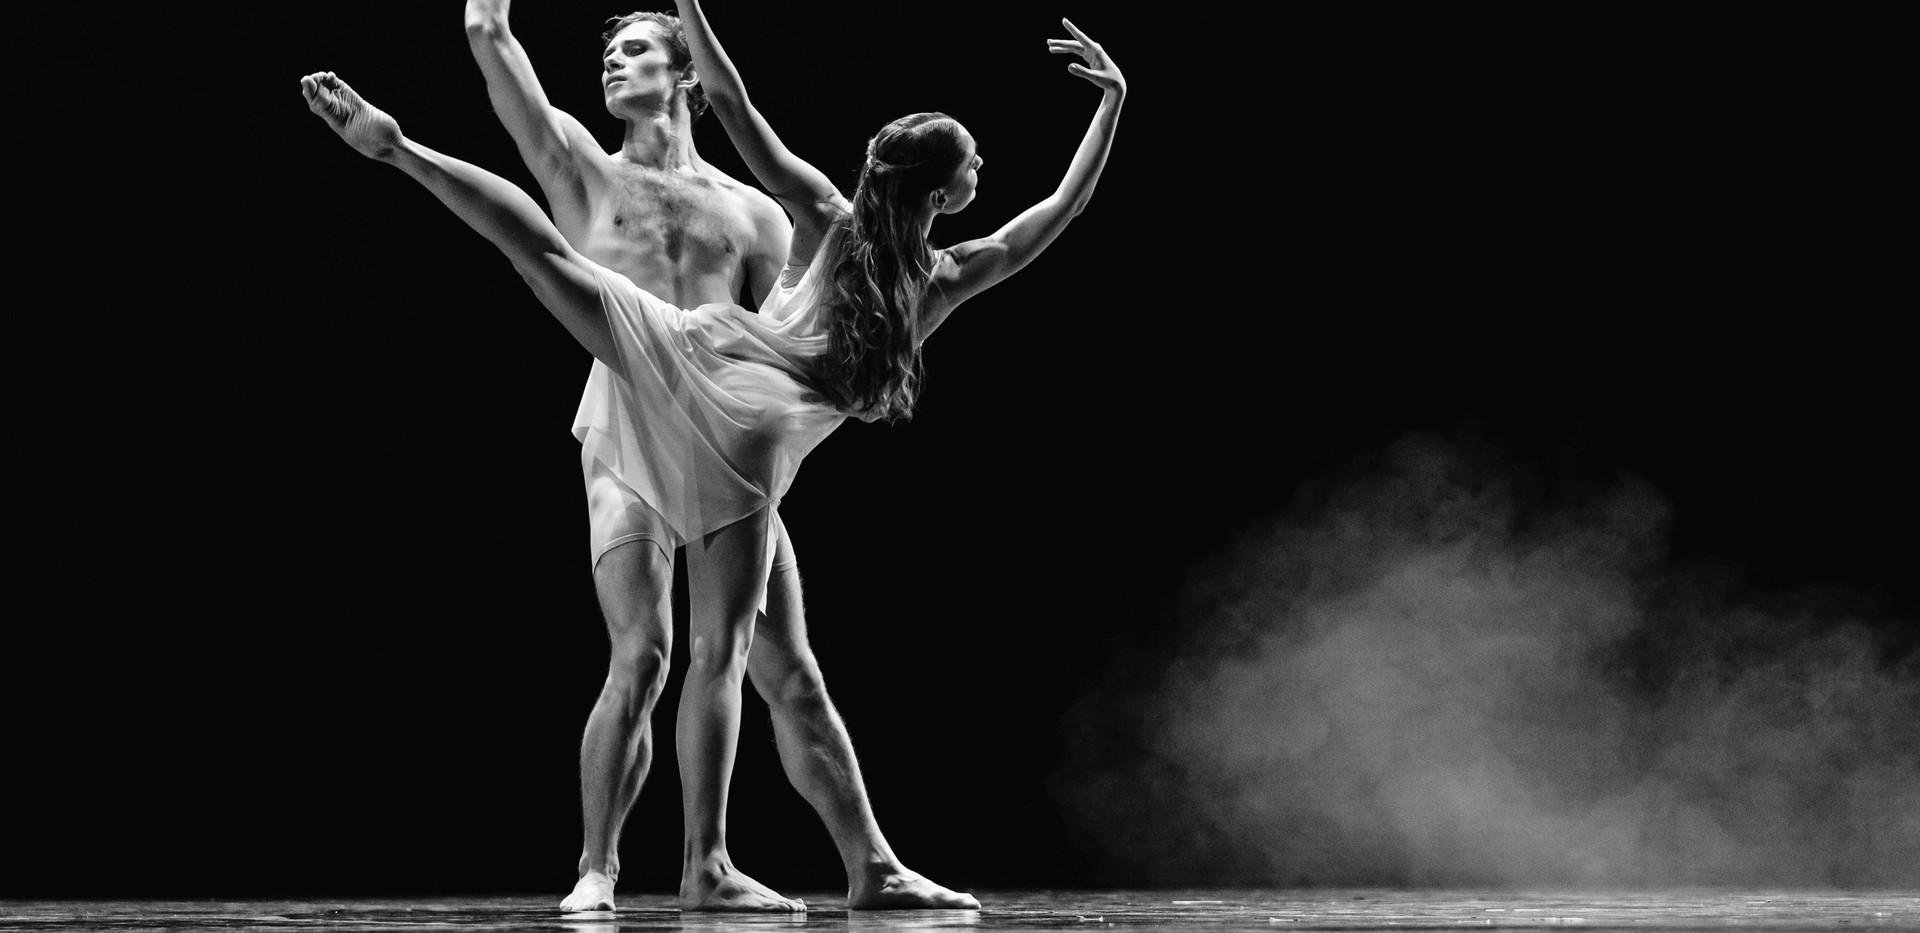 Yacobson Ballet - Ballet de Prokofiev©OPM2018